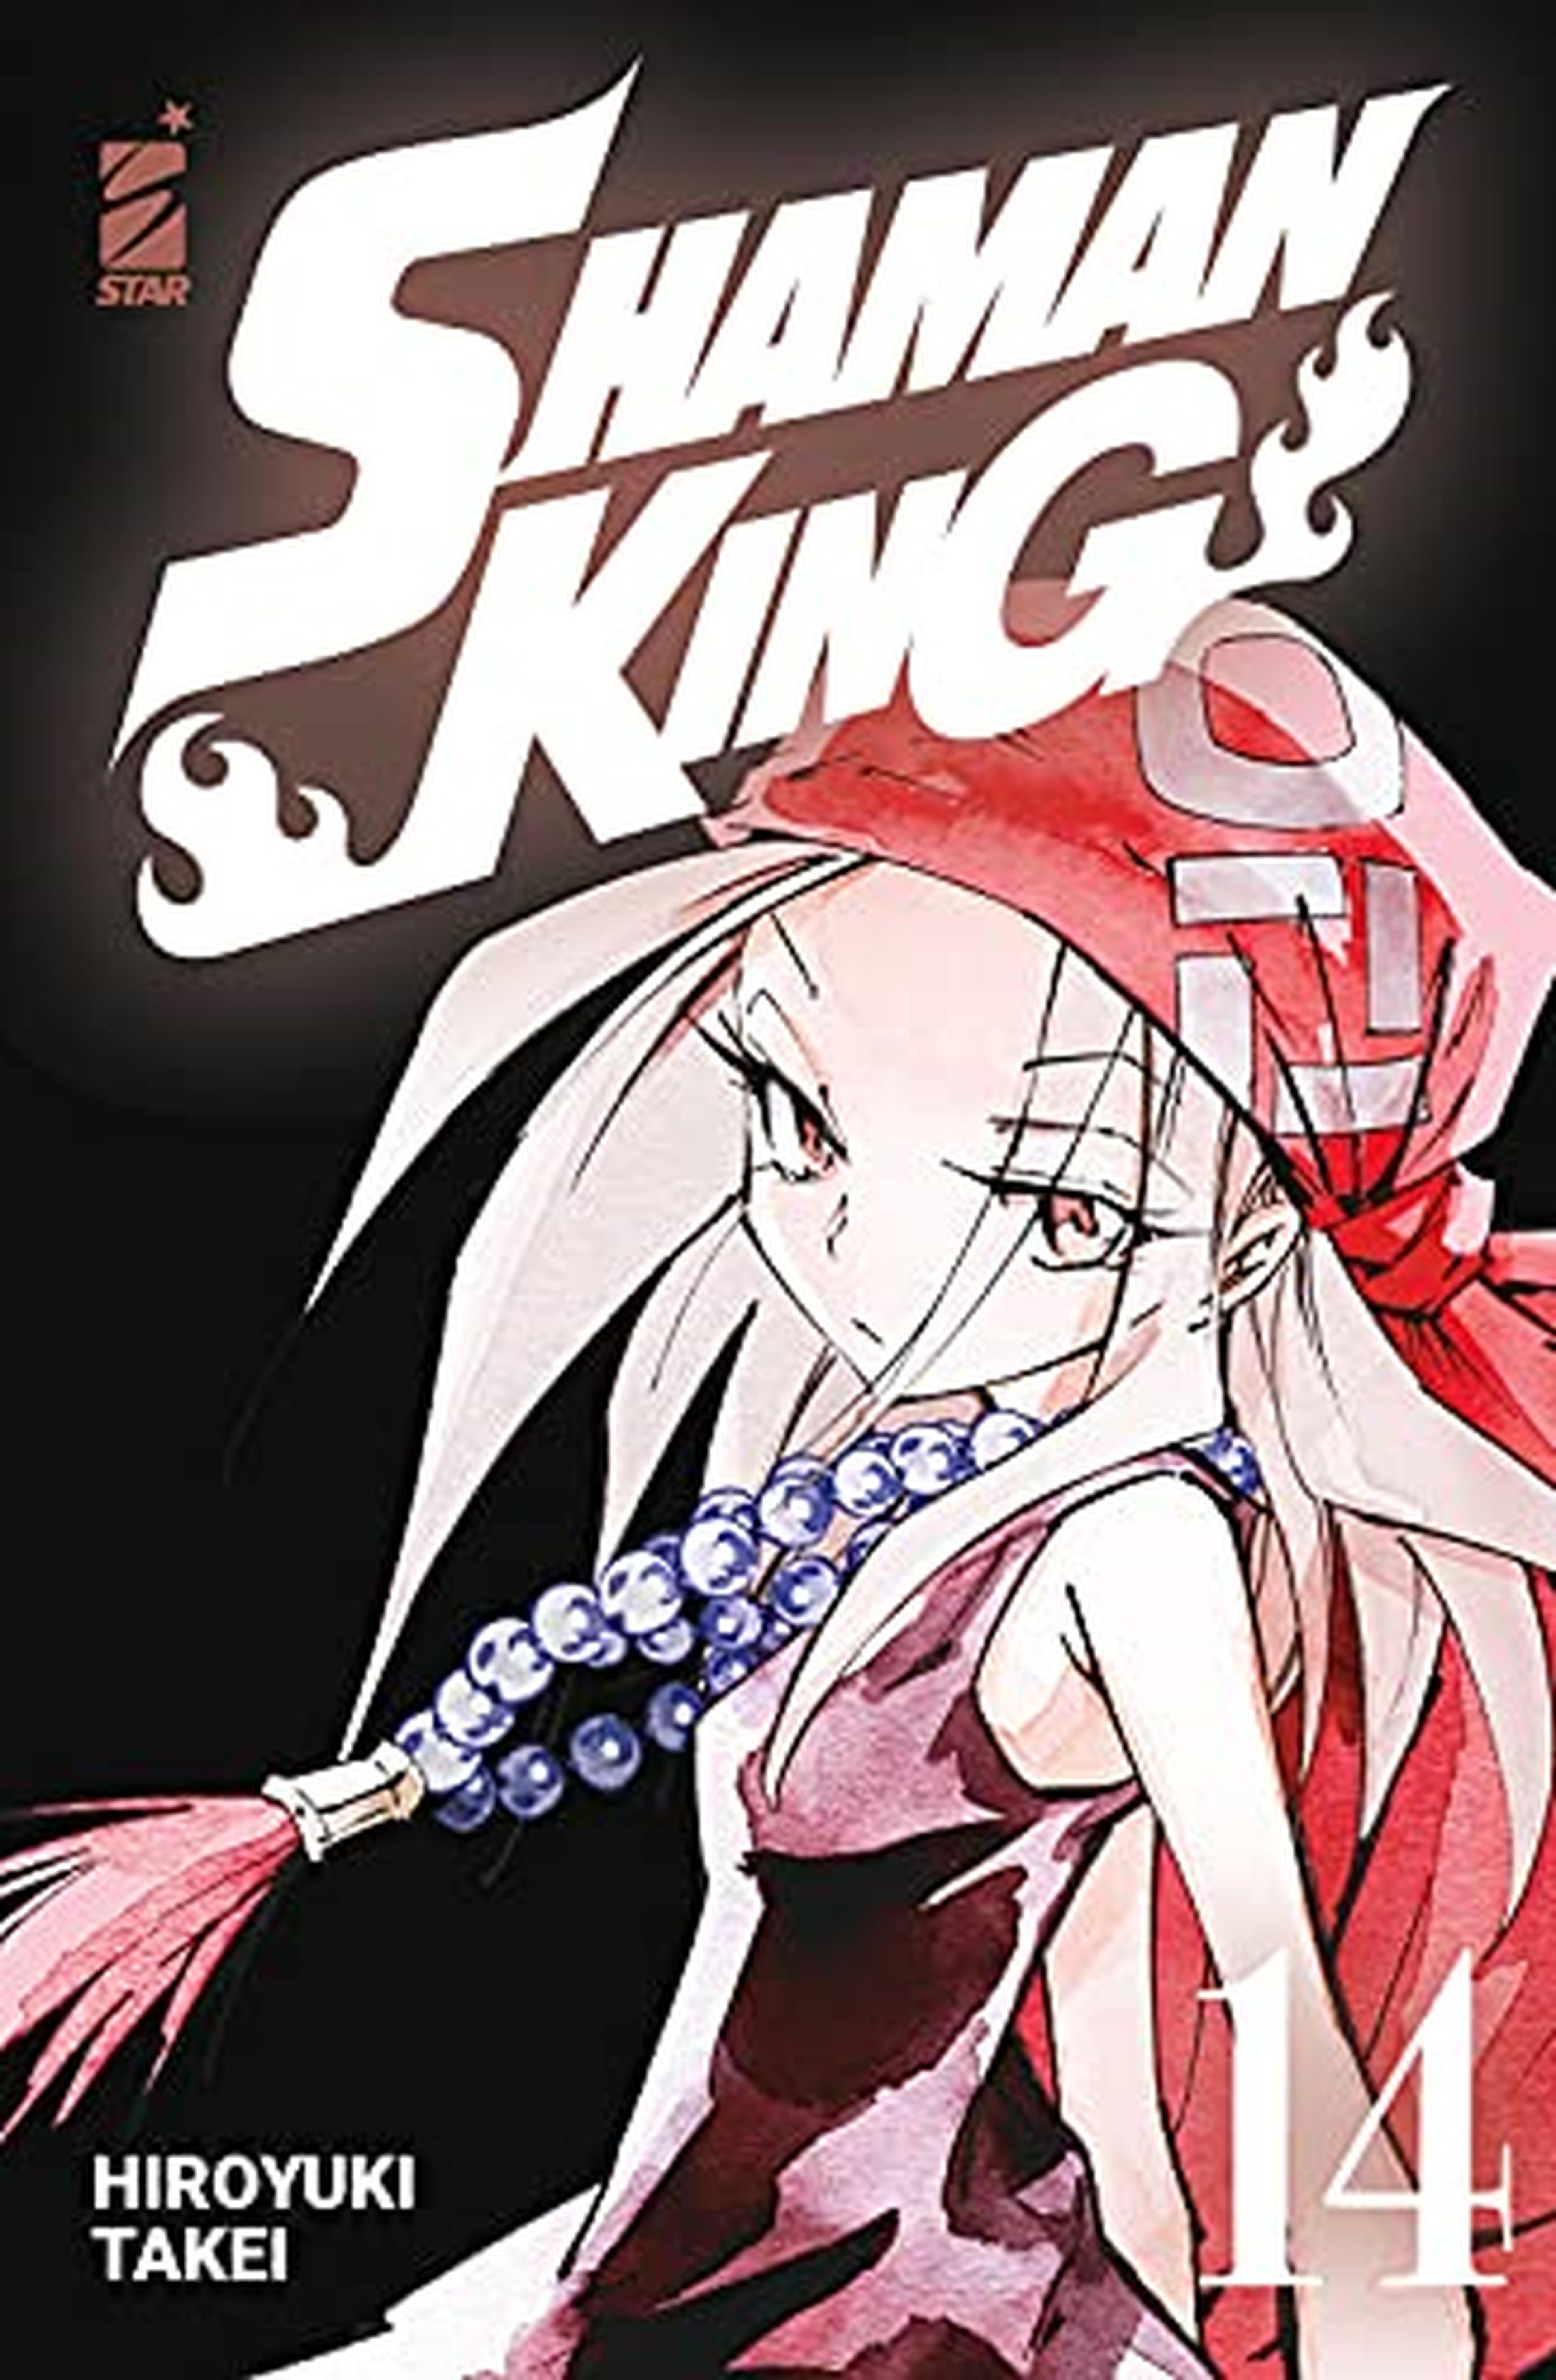 Shaman king. Final edition (Vol. 14)